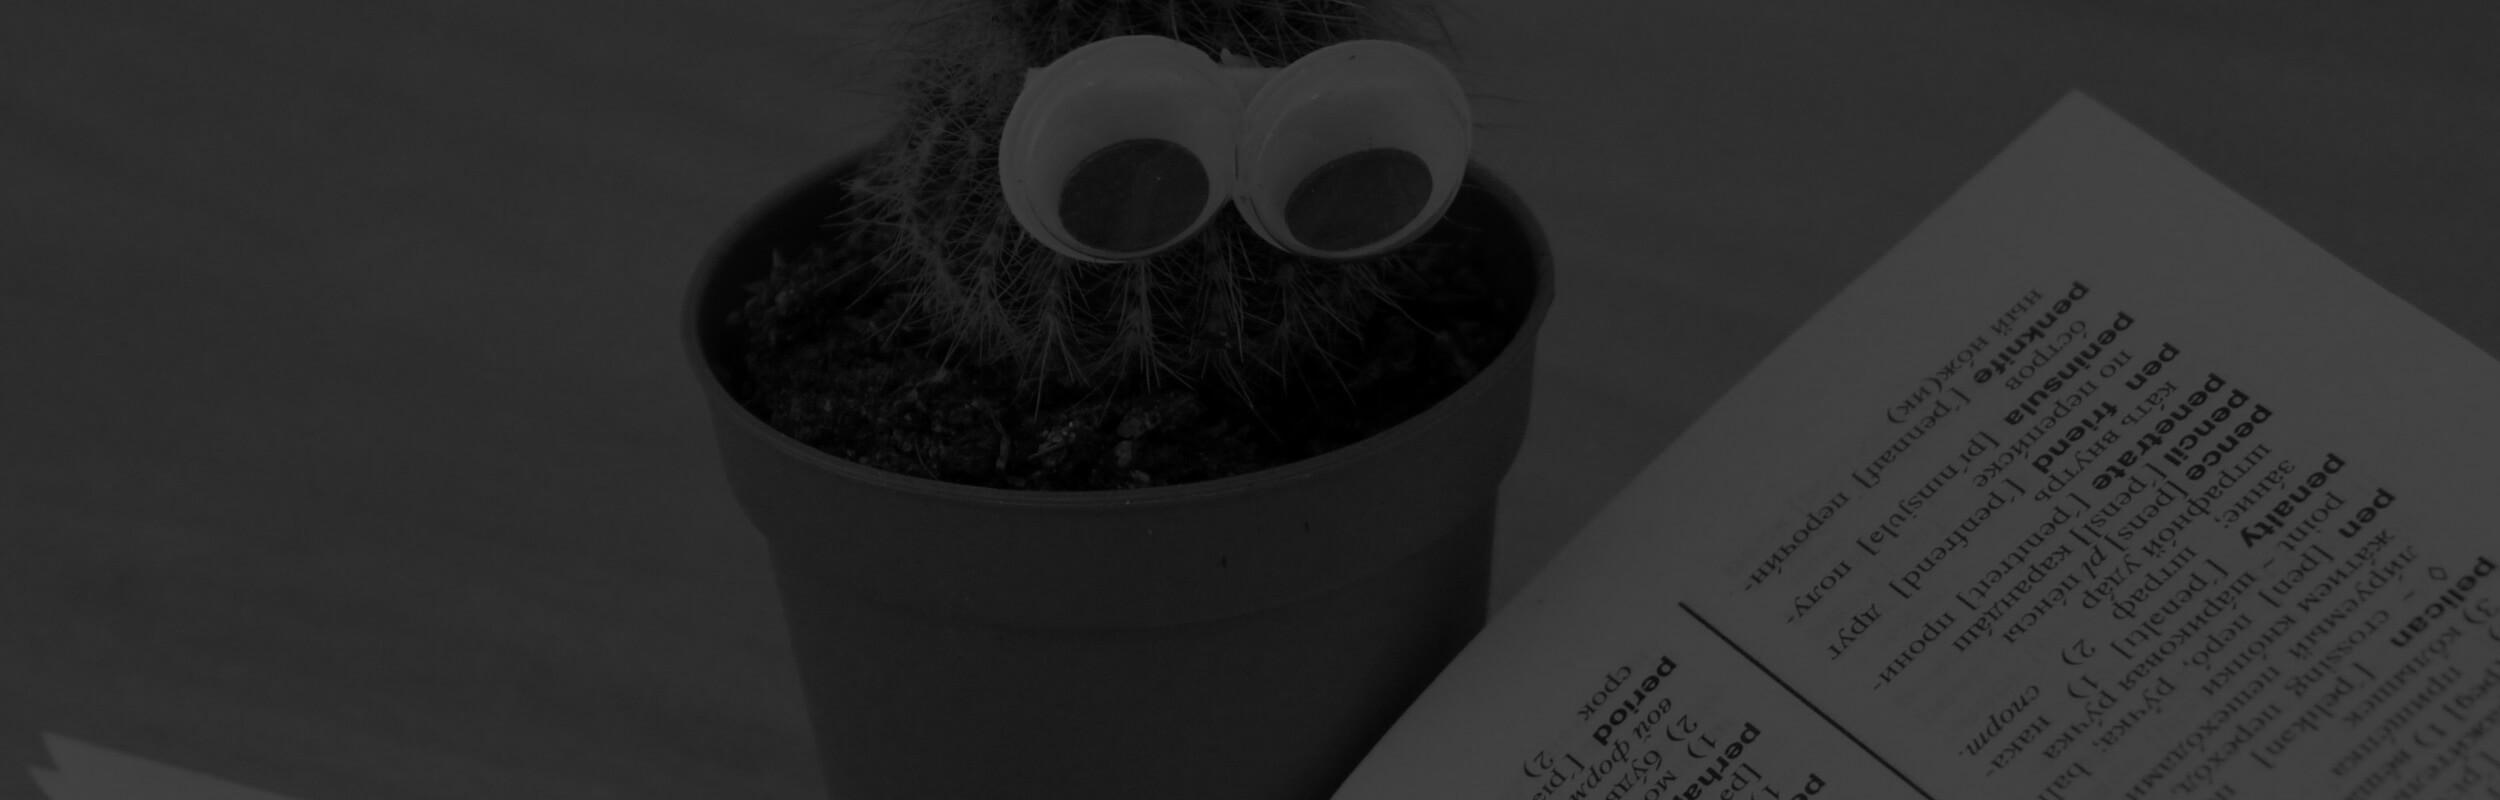 kaktus pozerá do knihy